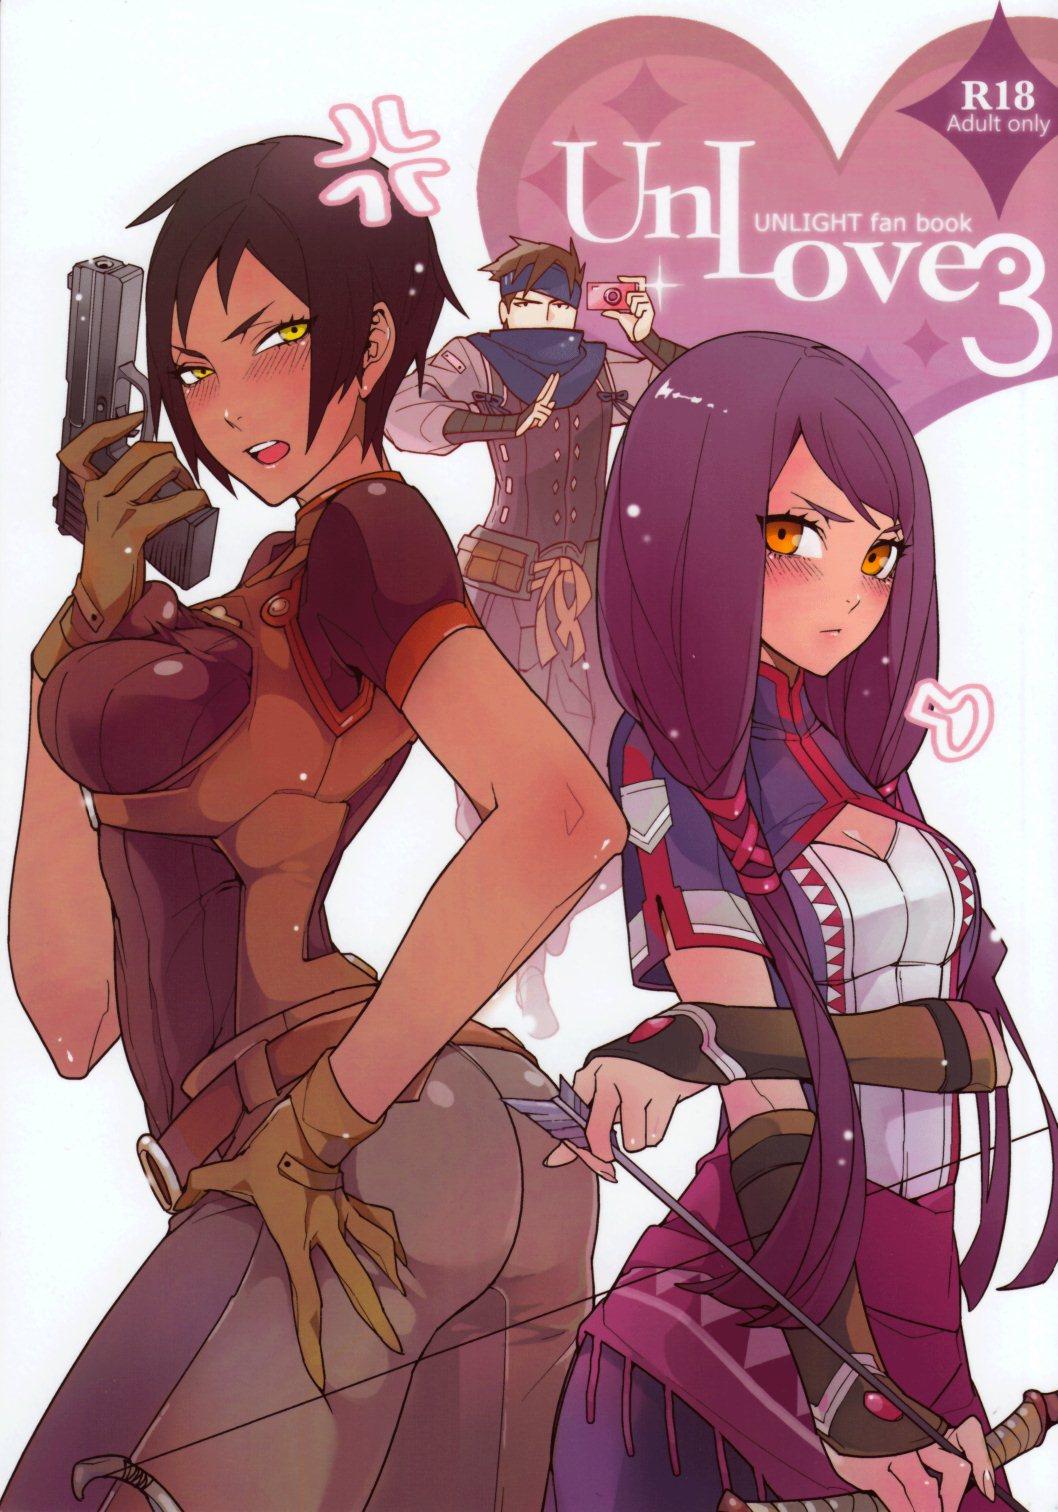 Porn Comics - Karei -UnLove 3 Unlight Fan Book porn comics 8 muses